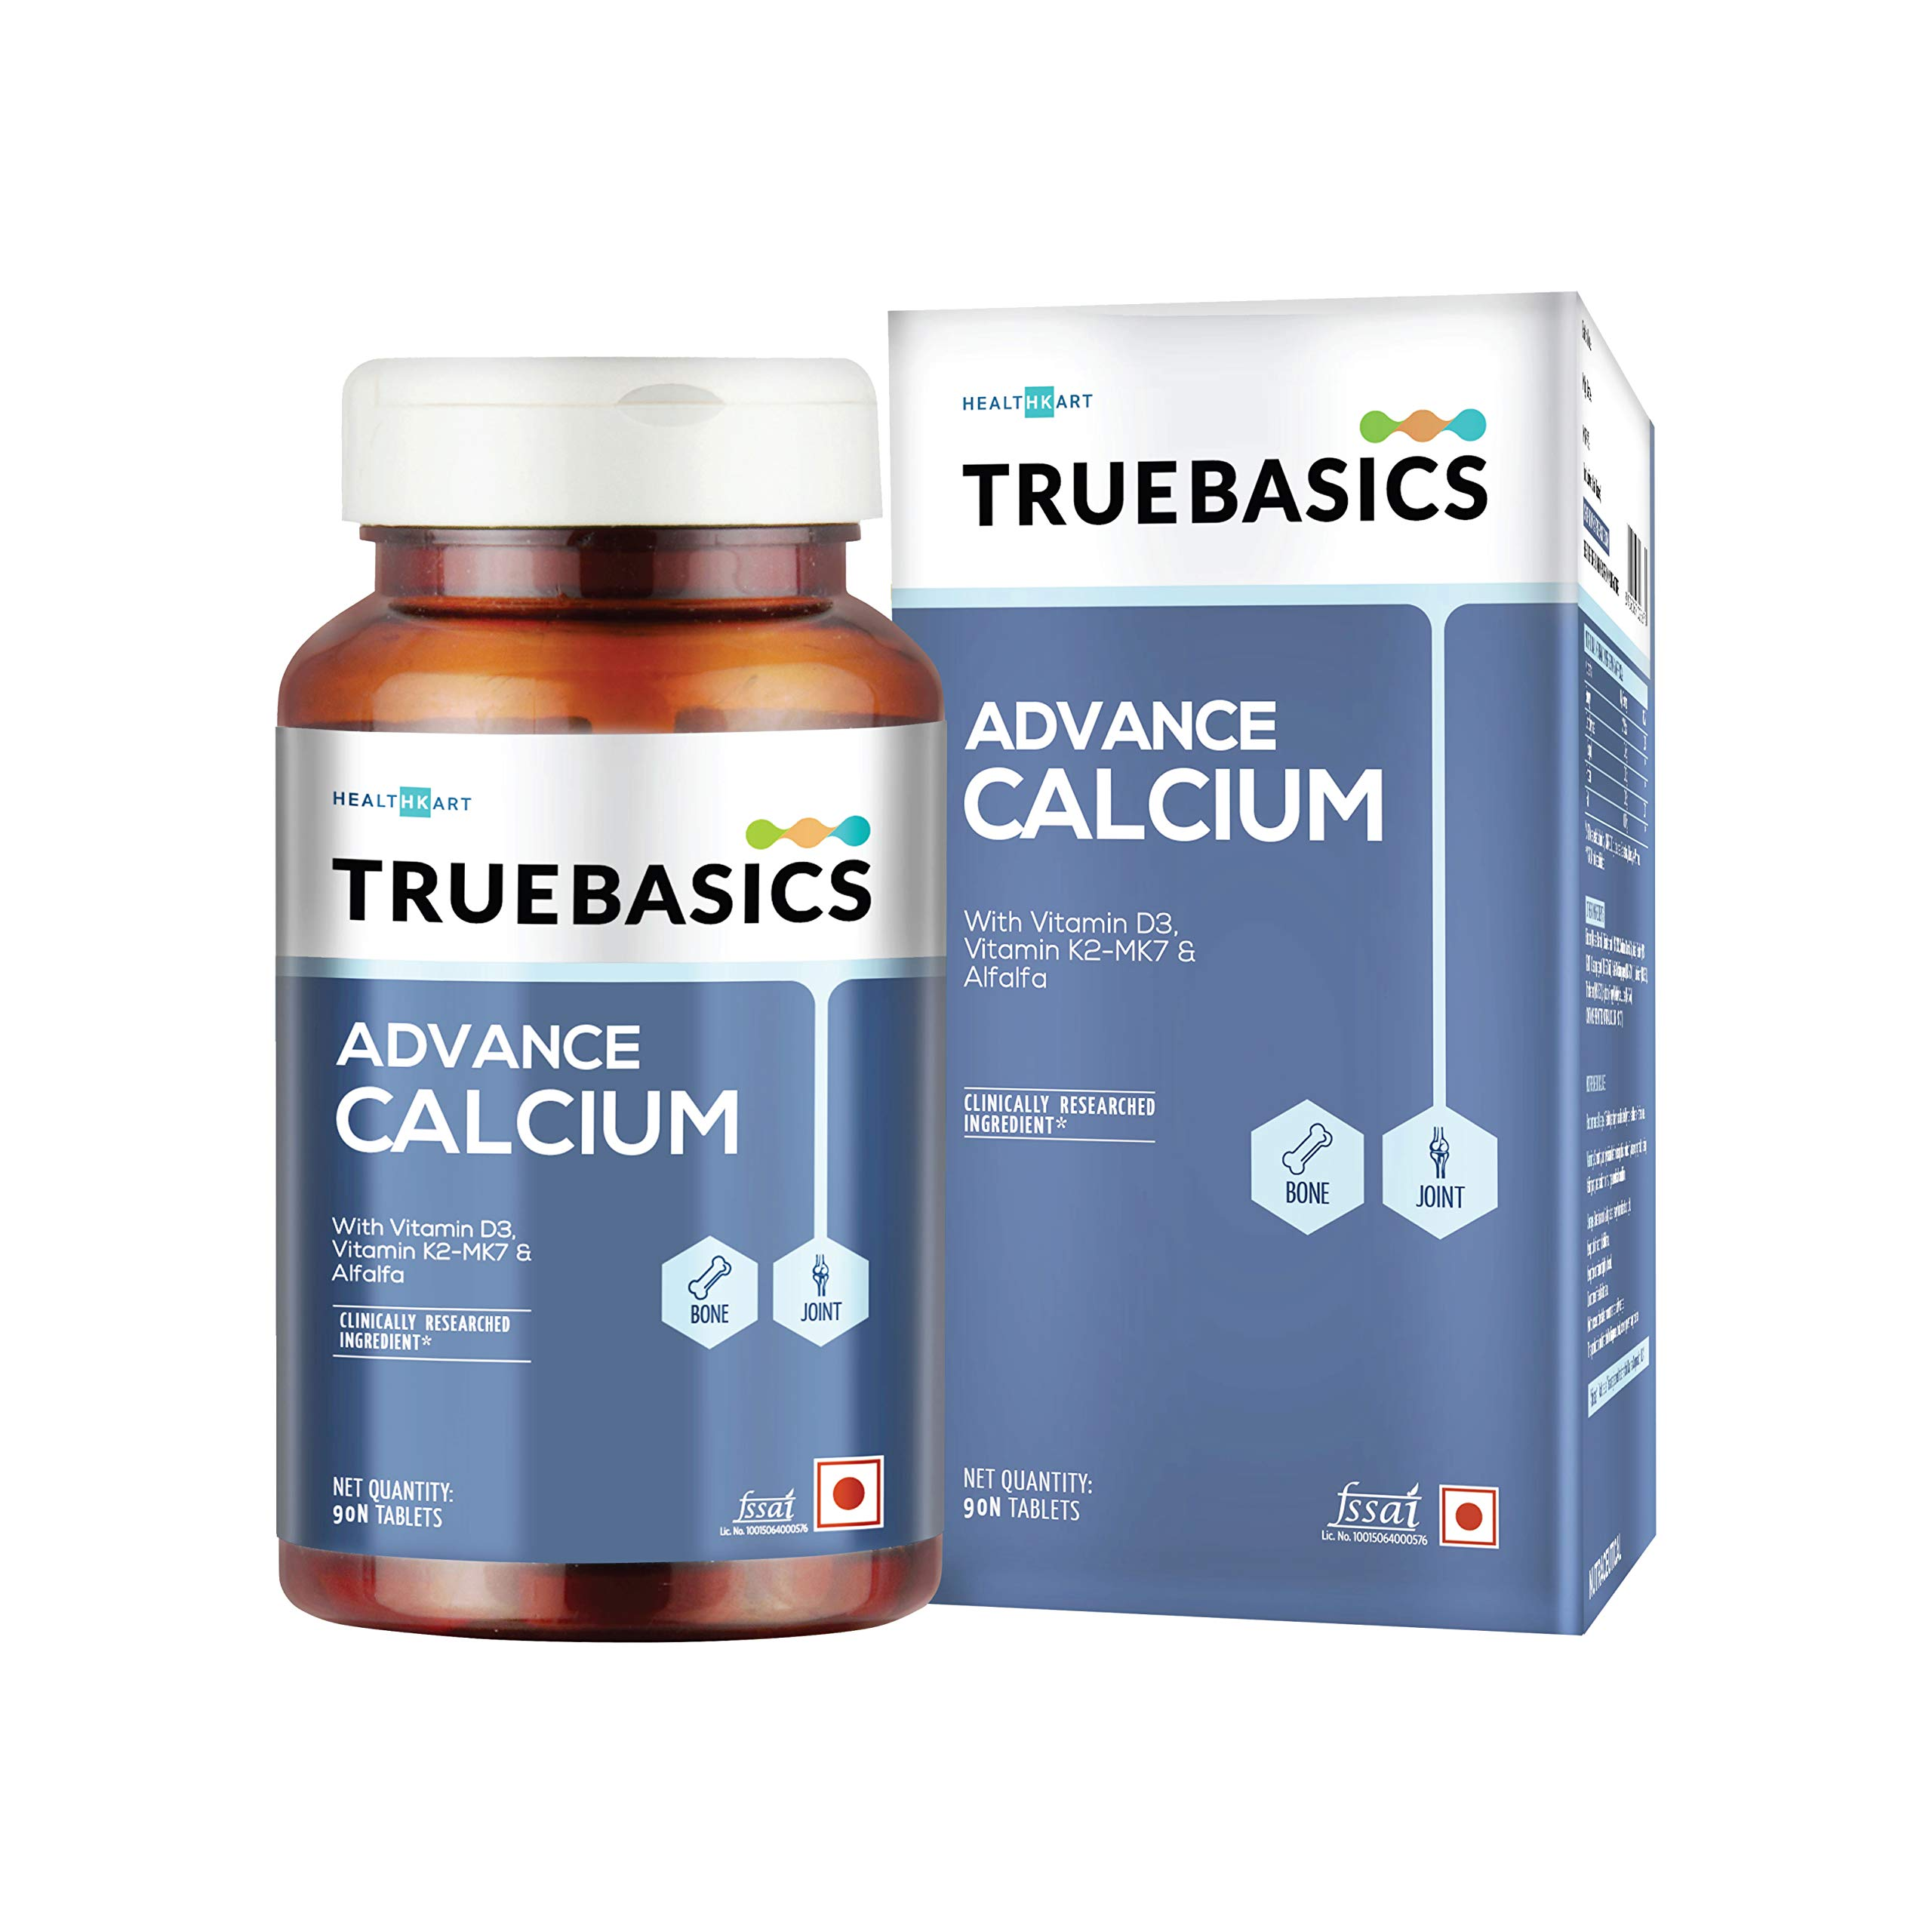 TrueBasics Advance Calcium with Vitamin D3, Vitamin K2-MK7, Magnesium, Zinc, Alfalfa | Clinically Researched Ingredient | (Calcium 90 Tablets)